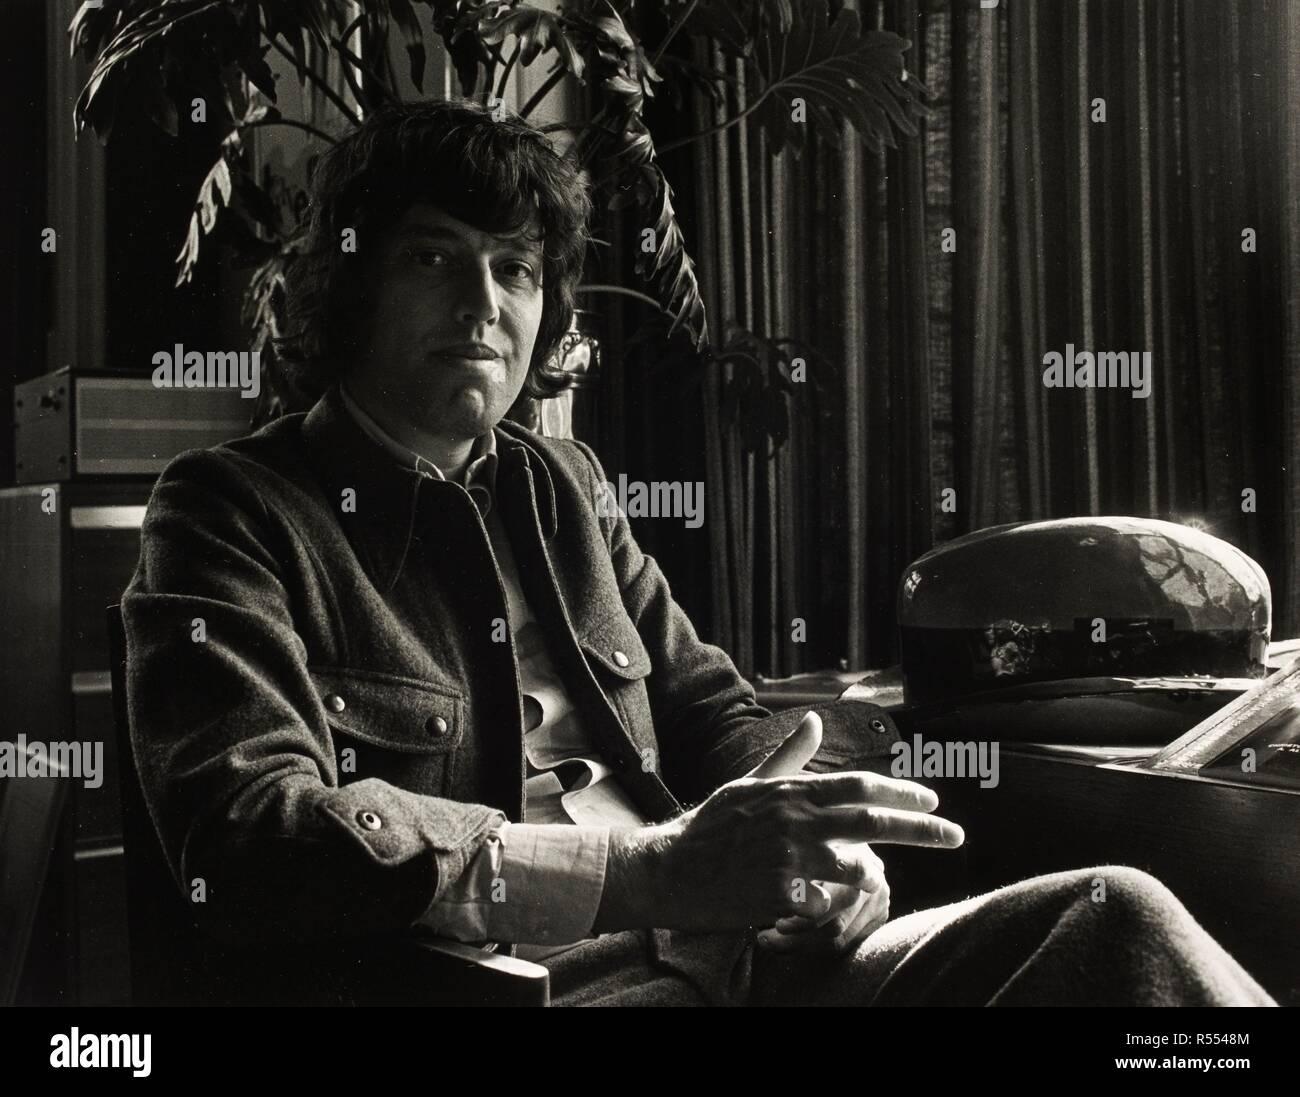 Tom Stoppard 1974. Monochrome. Source: FG2102-2-23. - Stock Image